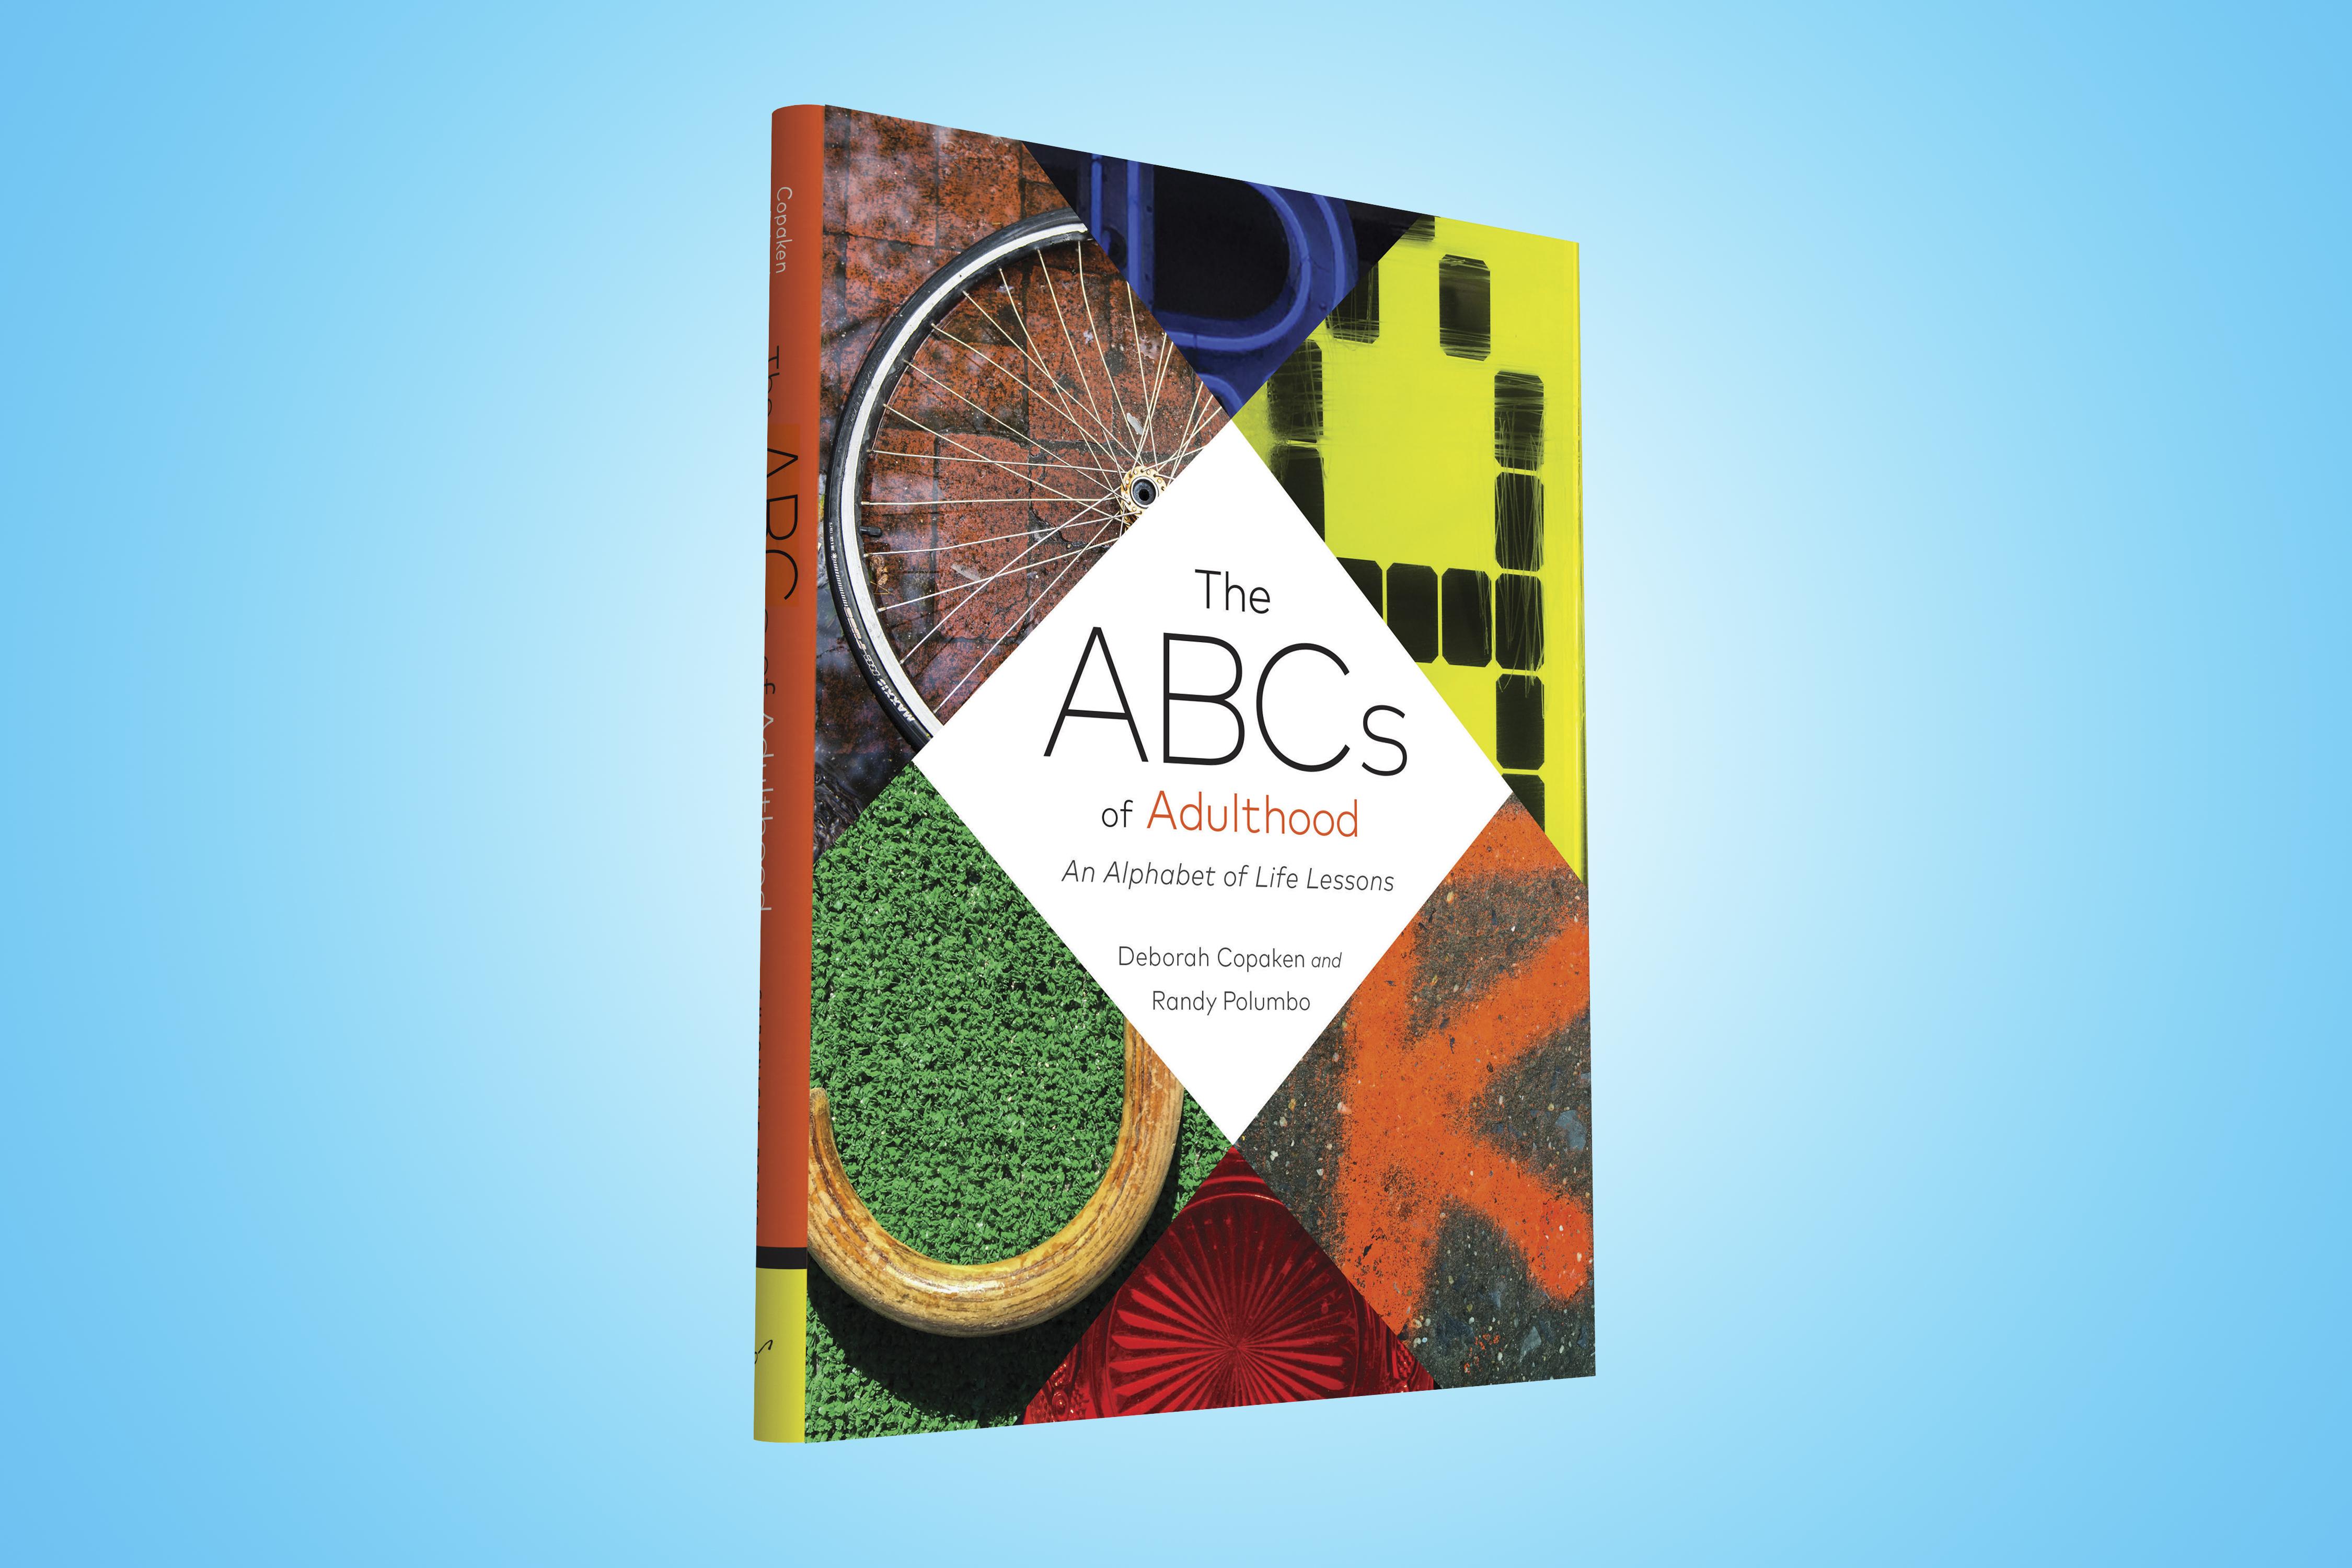 ABCs of Adulthood by Deborah Copaken, photographs by Randy Polumbo (Chronicle Books, 2016)